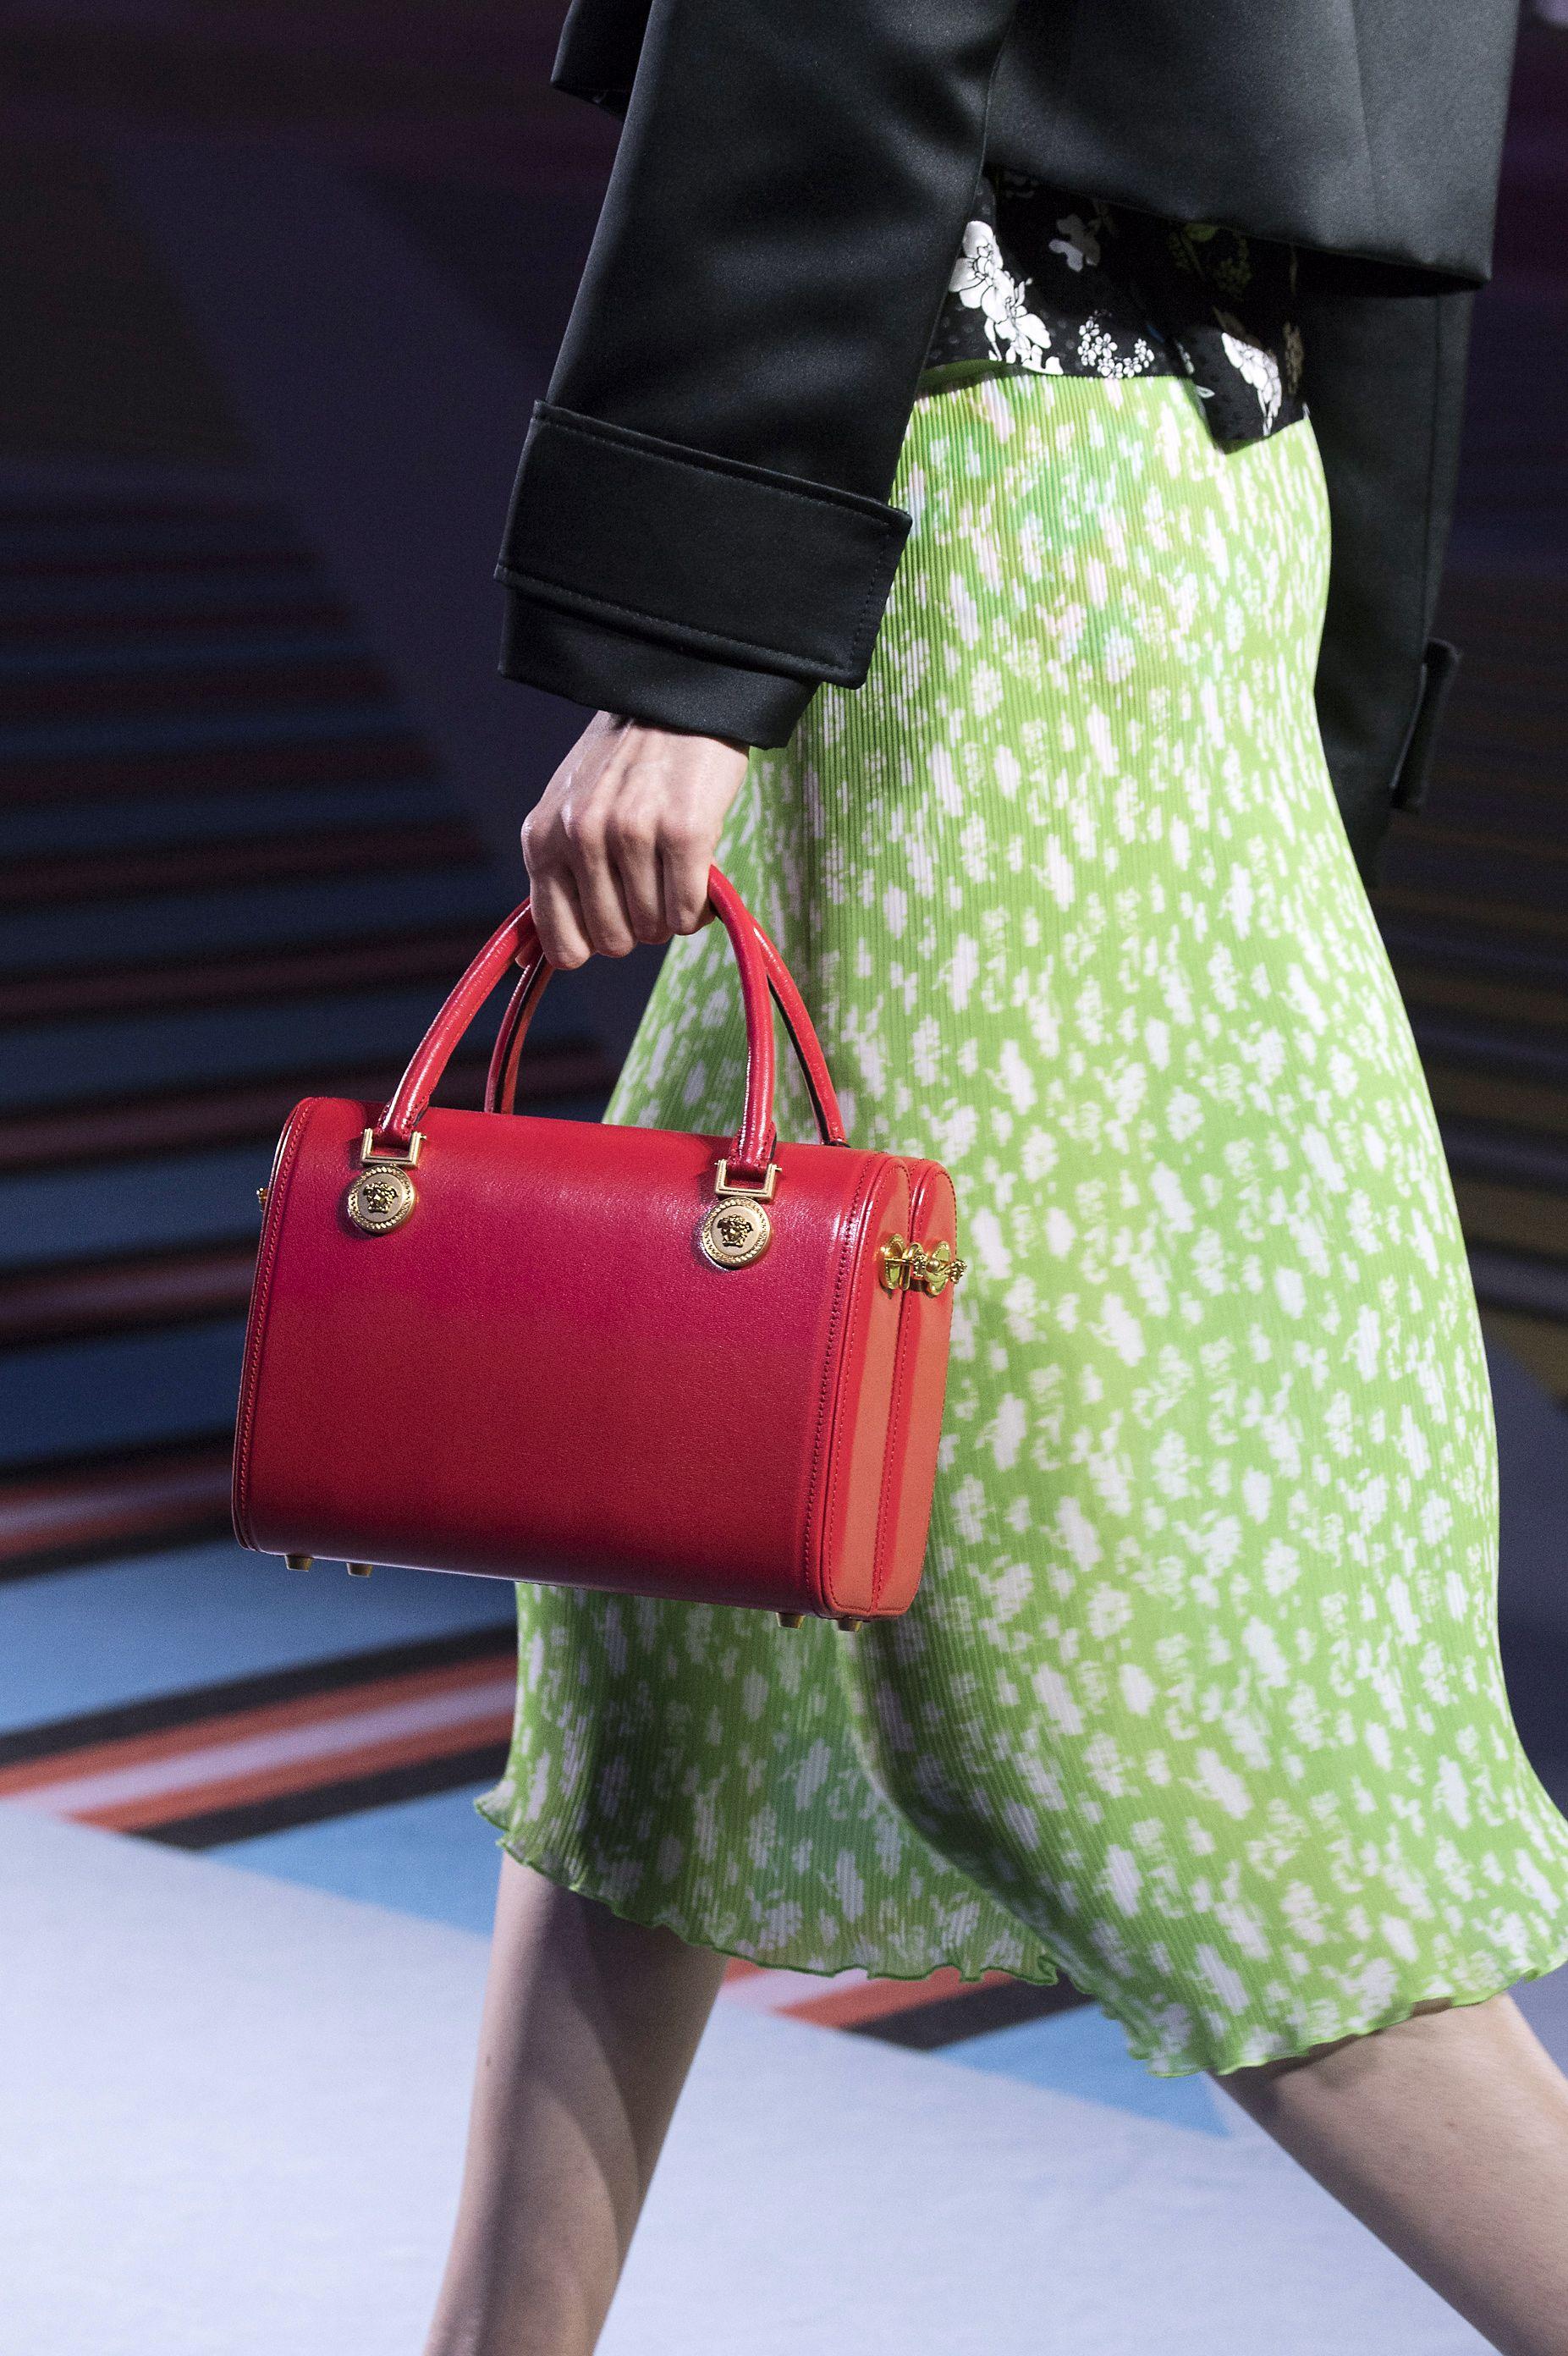 Fashion style 25 women best fashion handbags trends uk for woman